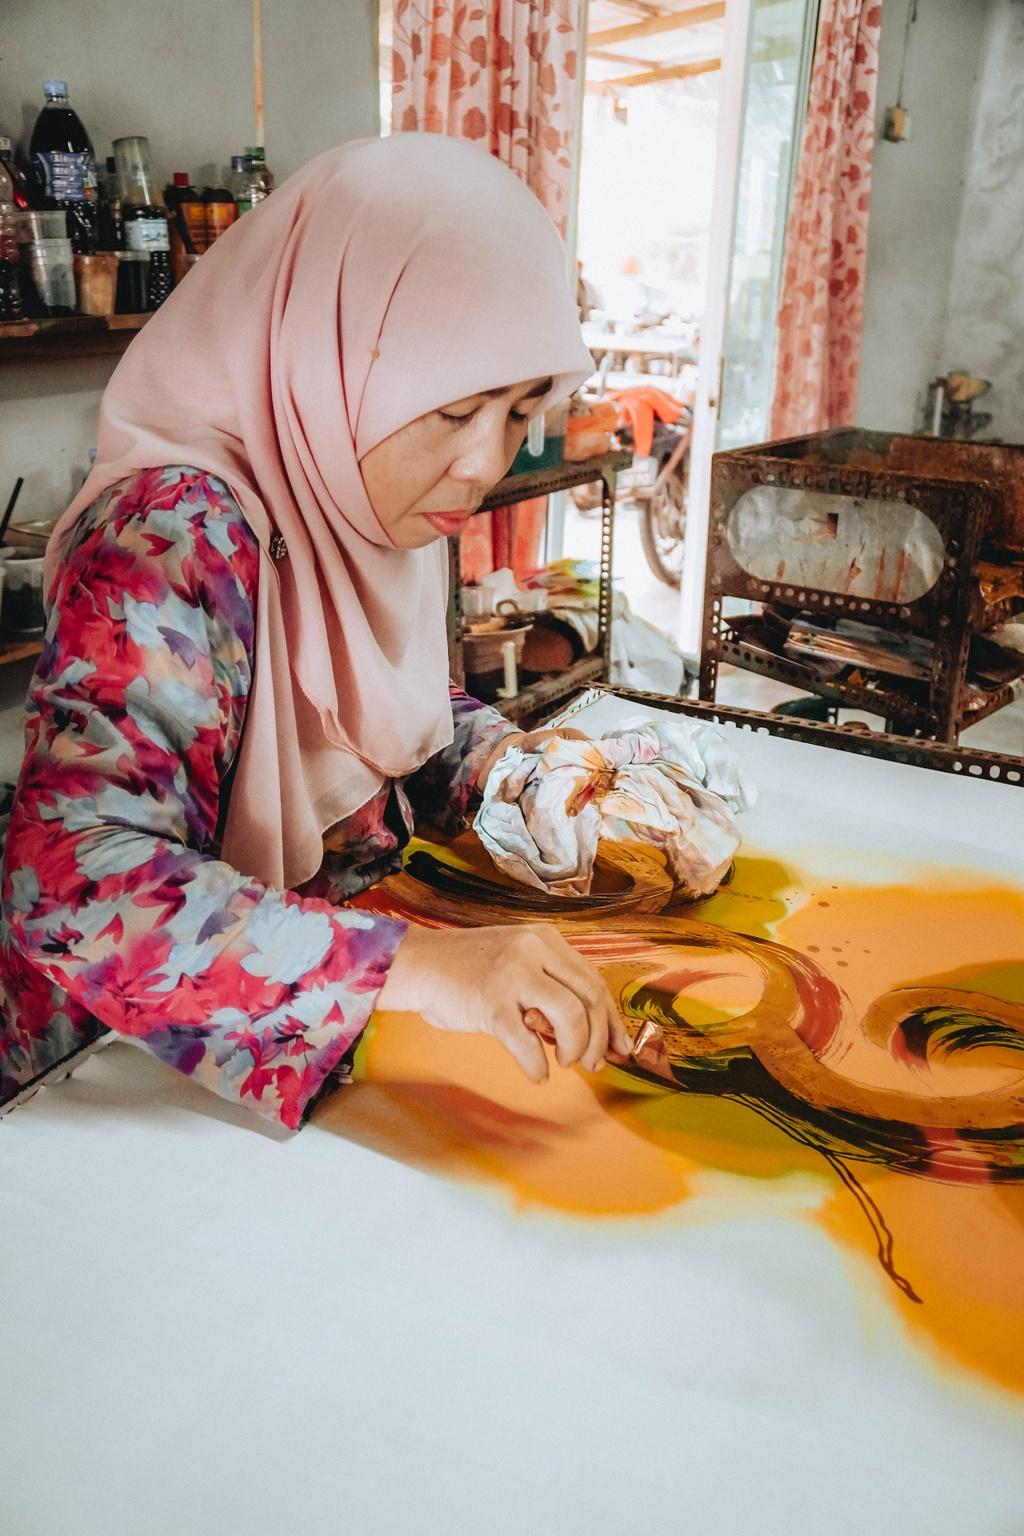 Travel blogger Gia Ngoc Hue diem danh 7 noi phai den o Johor Bahru hinh anh 2